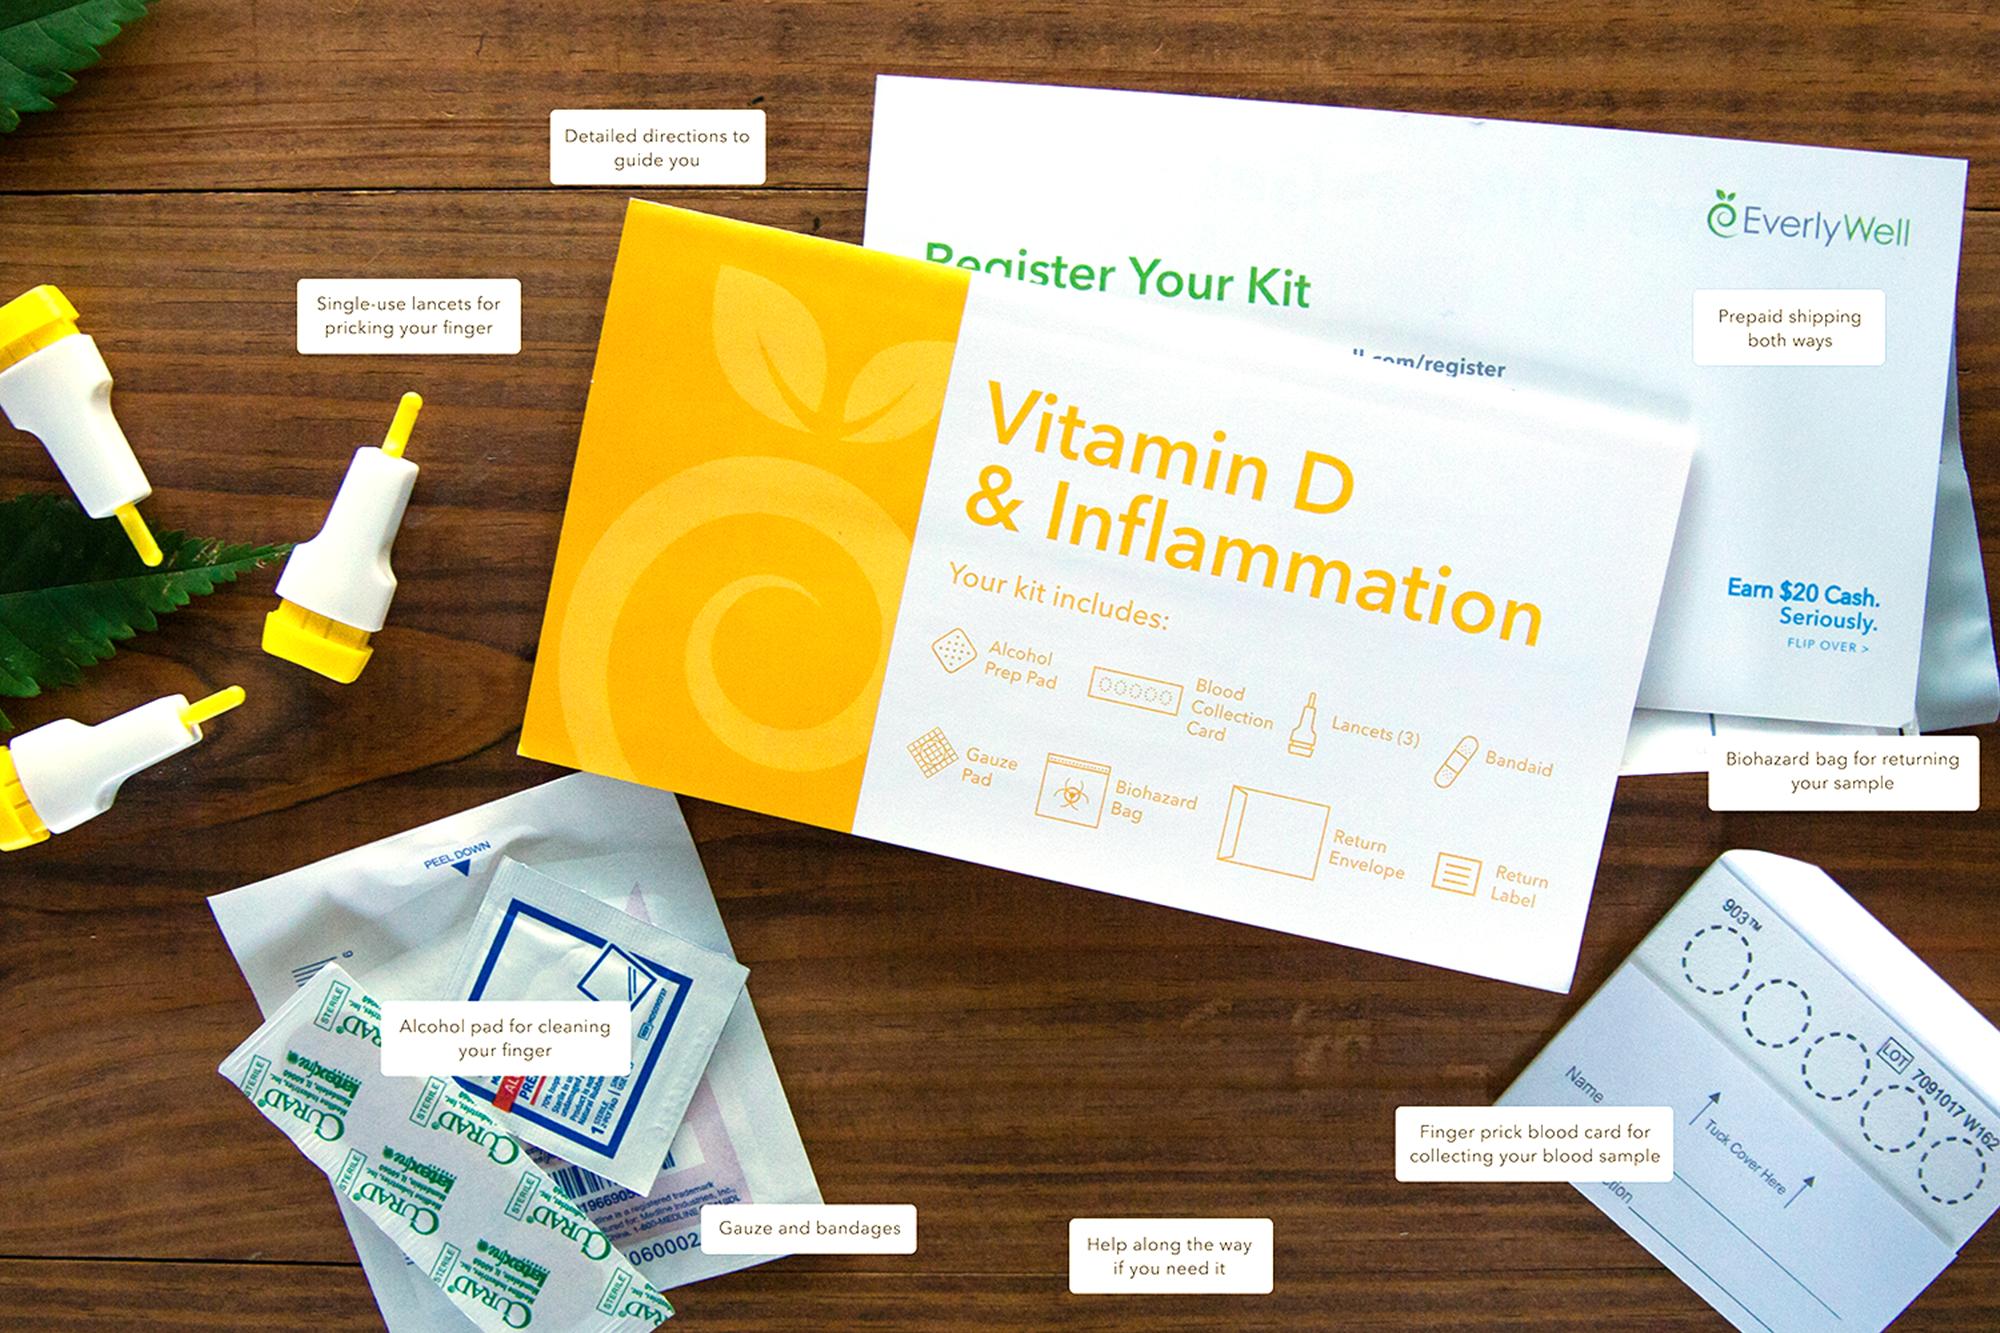 Virtamin D + Inflammation